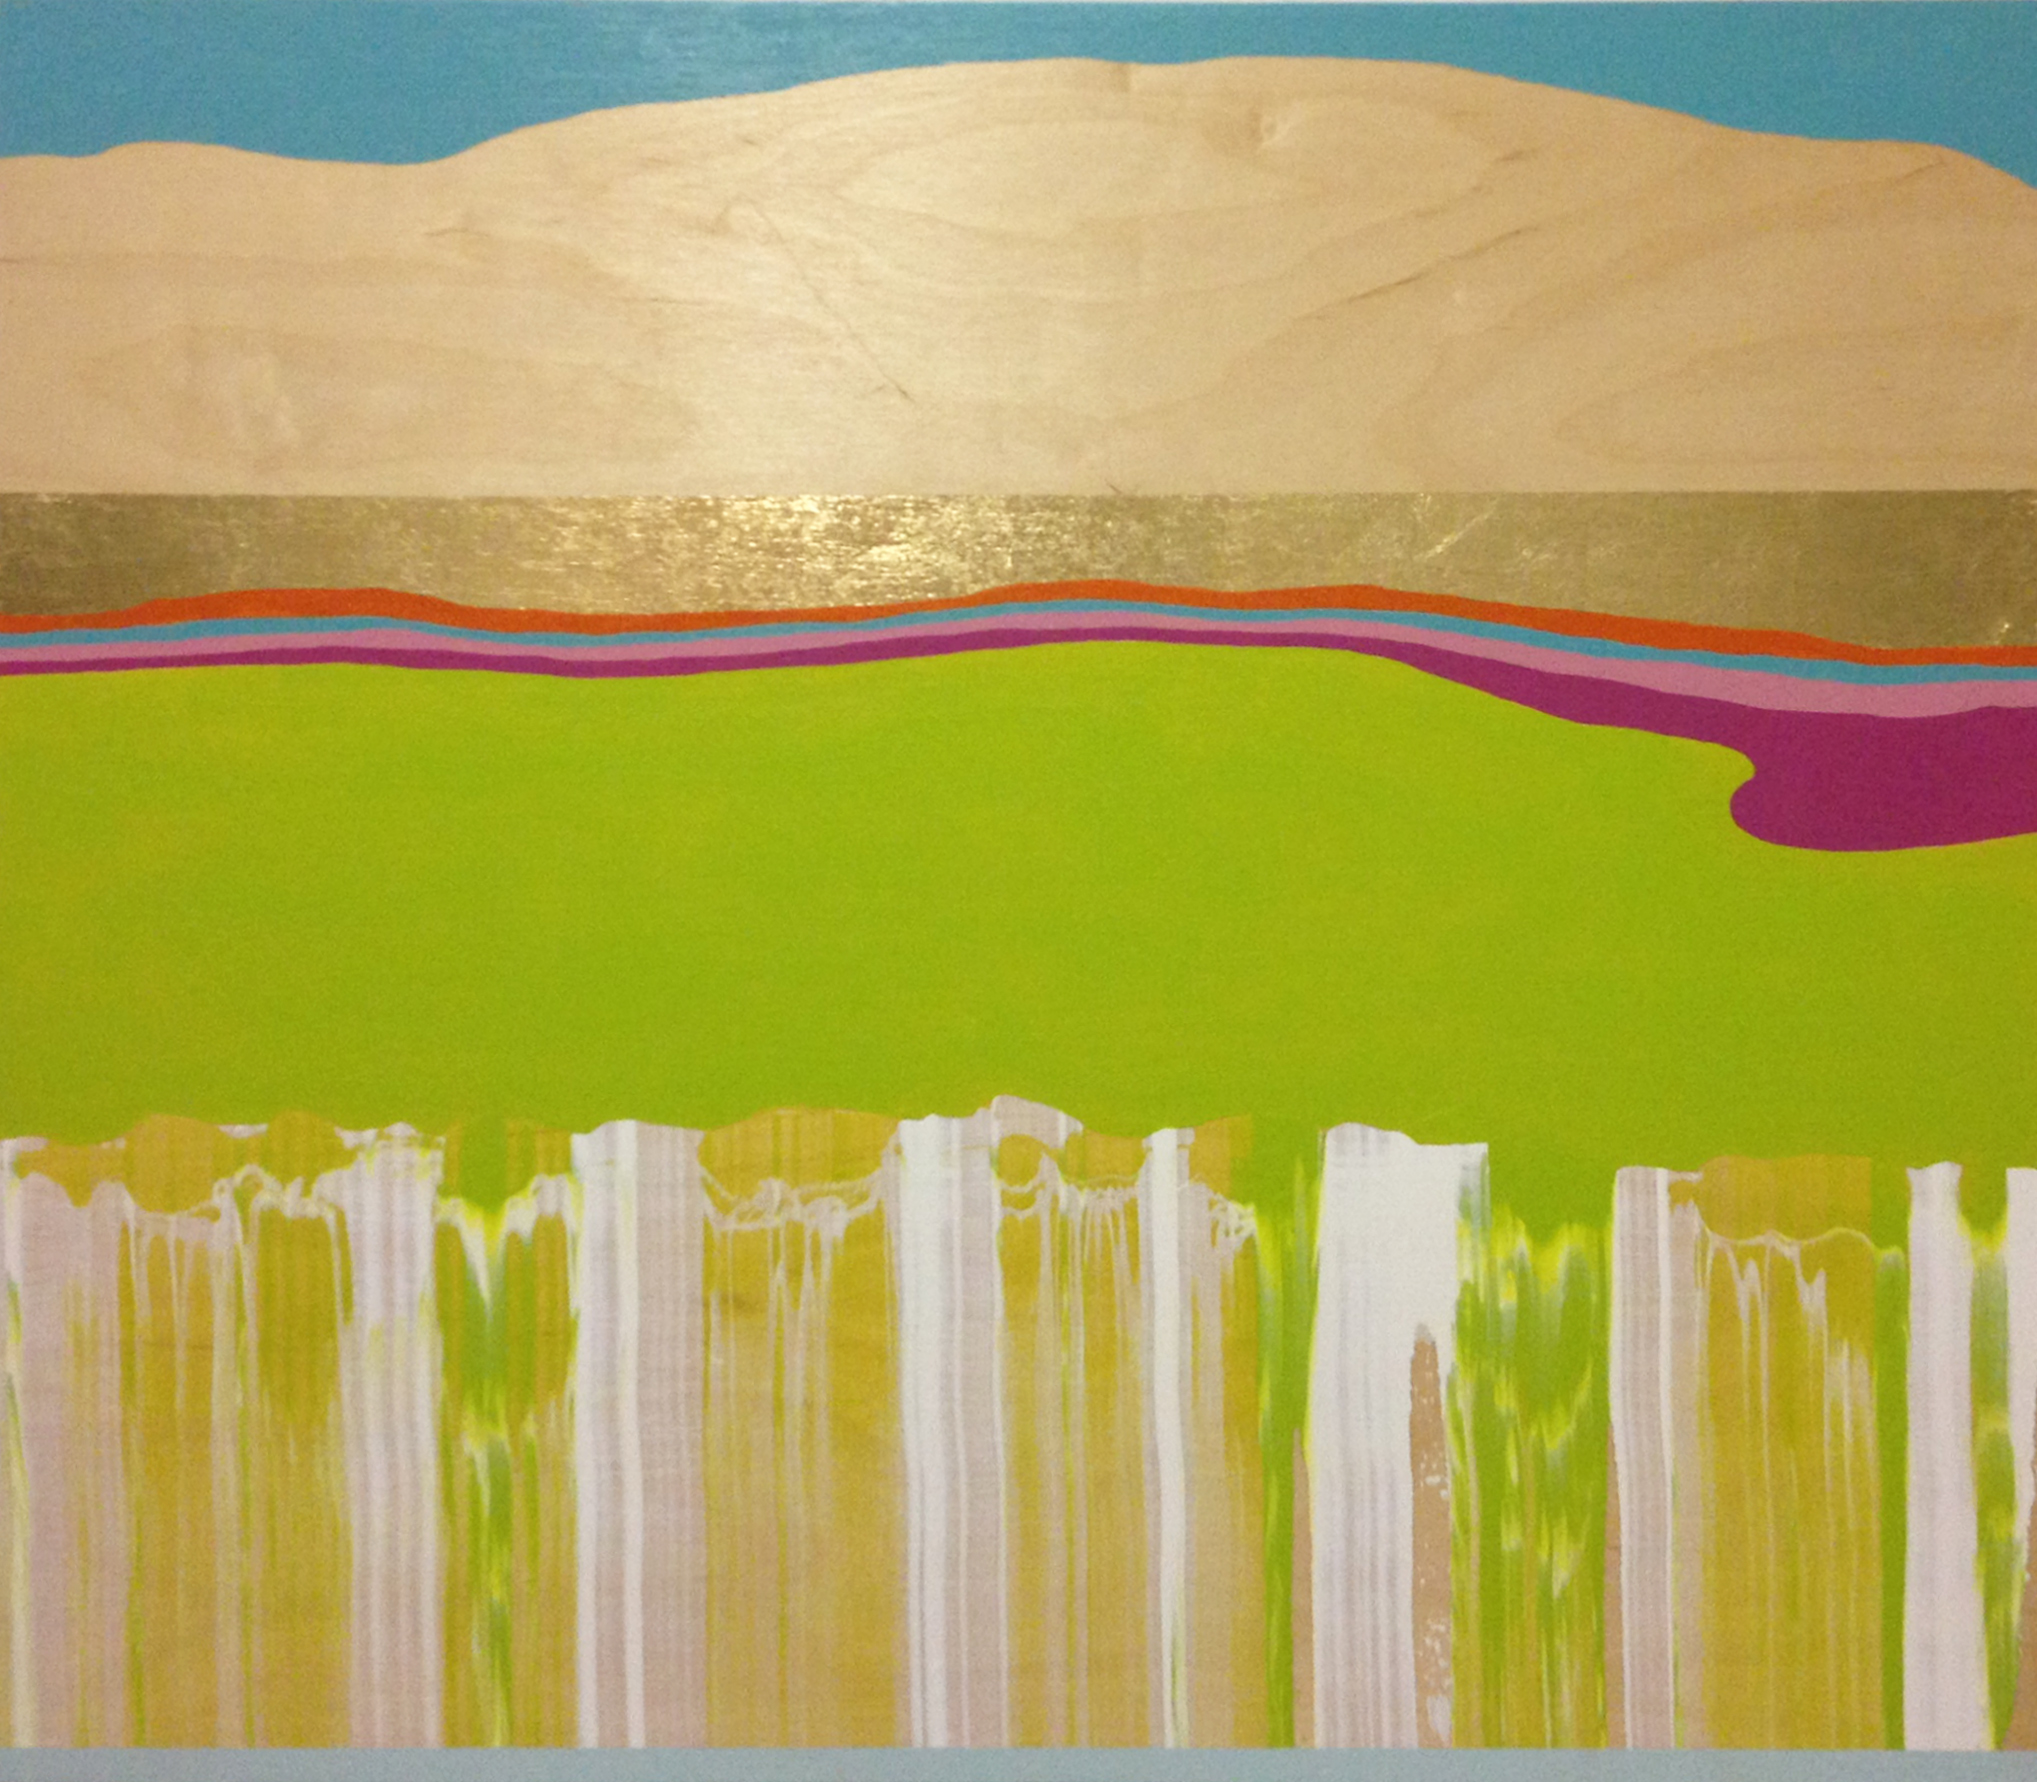 Seas Horizon_acrylic and gold leaf on wood panel_40x46_2100.jpg